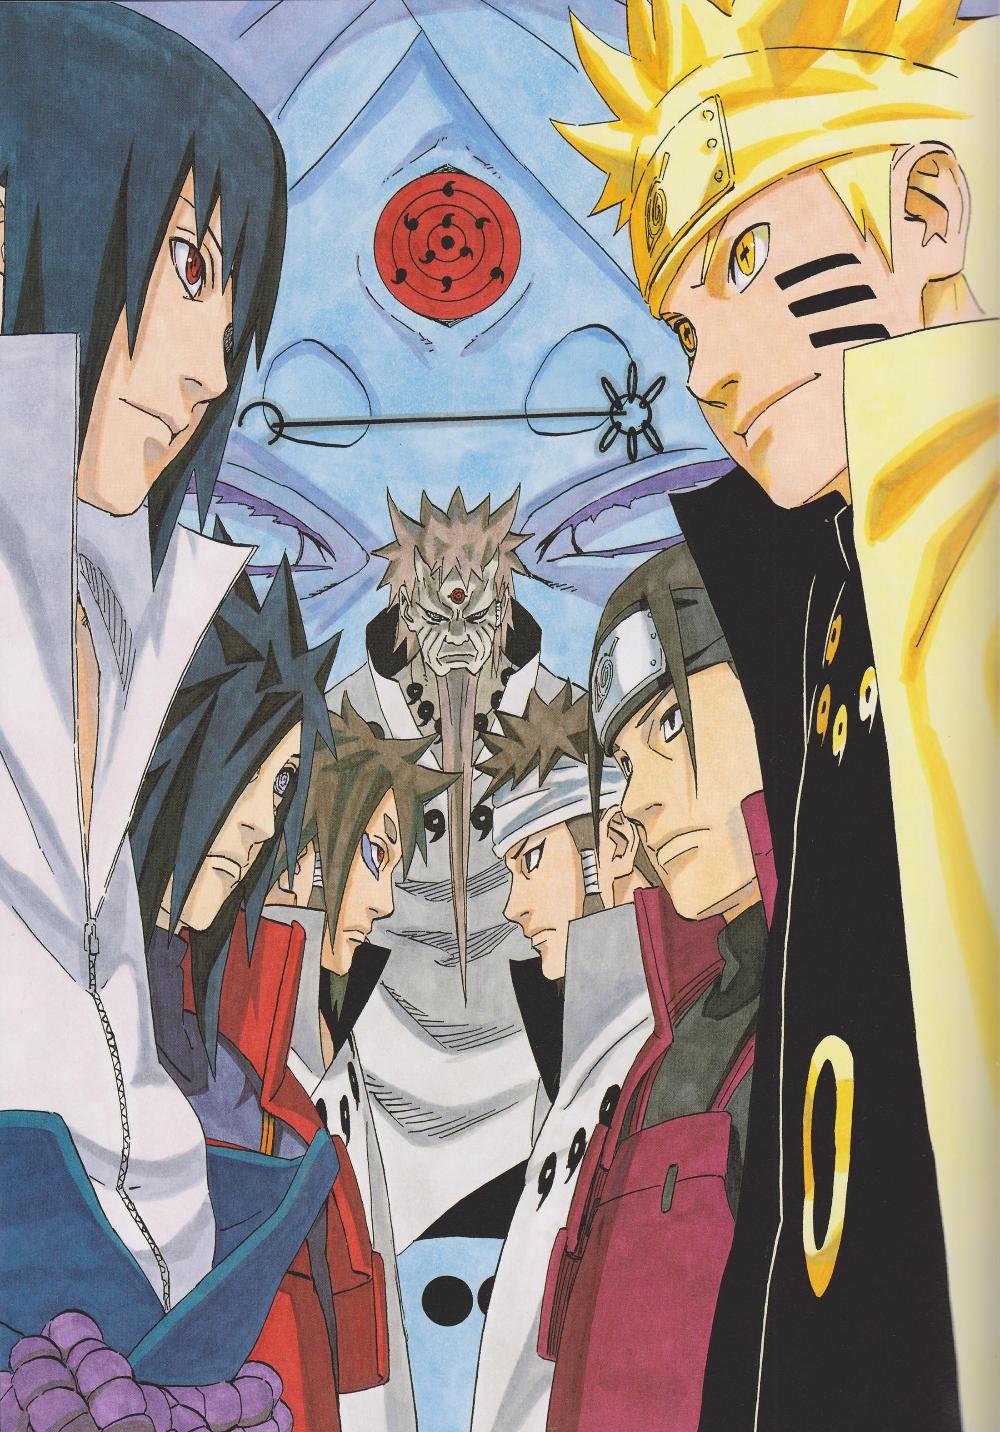 Wallpaper Naruto Fond D Ecran Les Meilleurs Fond D Ecran Naruto Sasuke Manga Wallpaper Euror Narutowallpaper In 2020 Naruto Shippuden Anime Naruto Shippuden Sasuke Anime